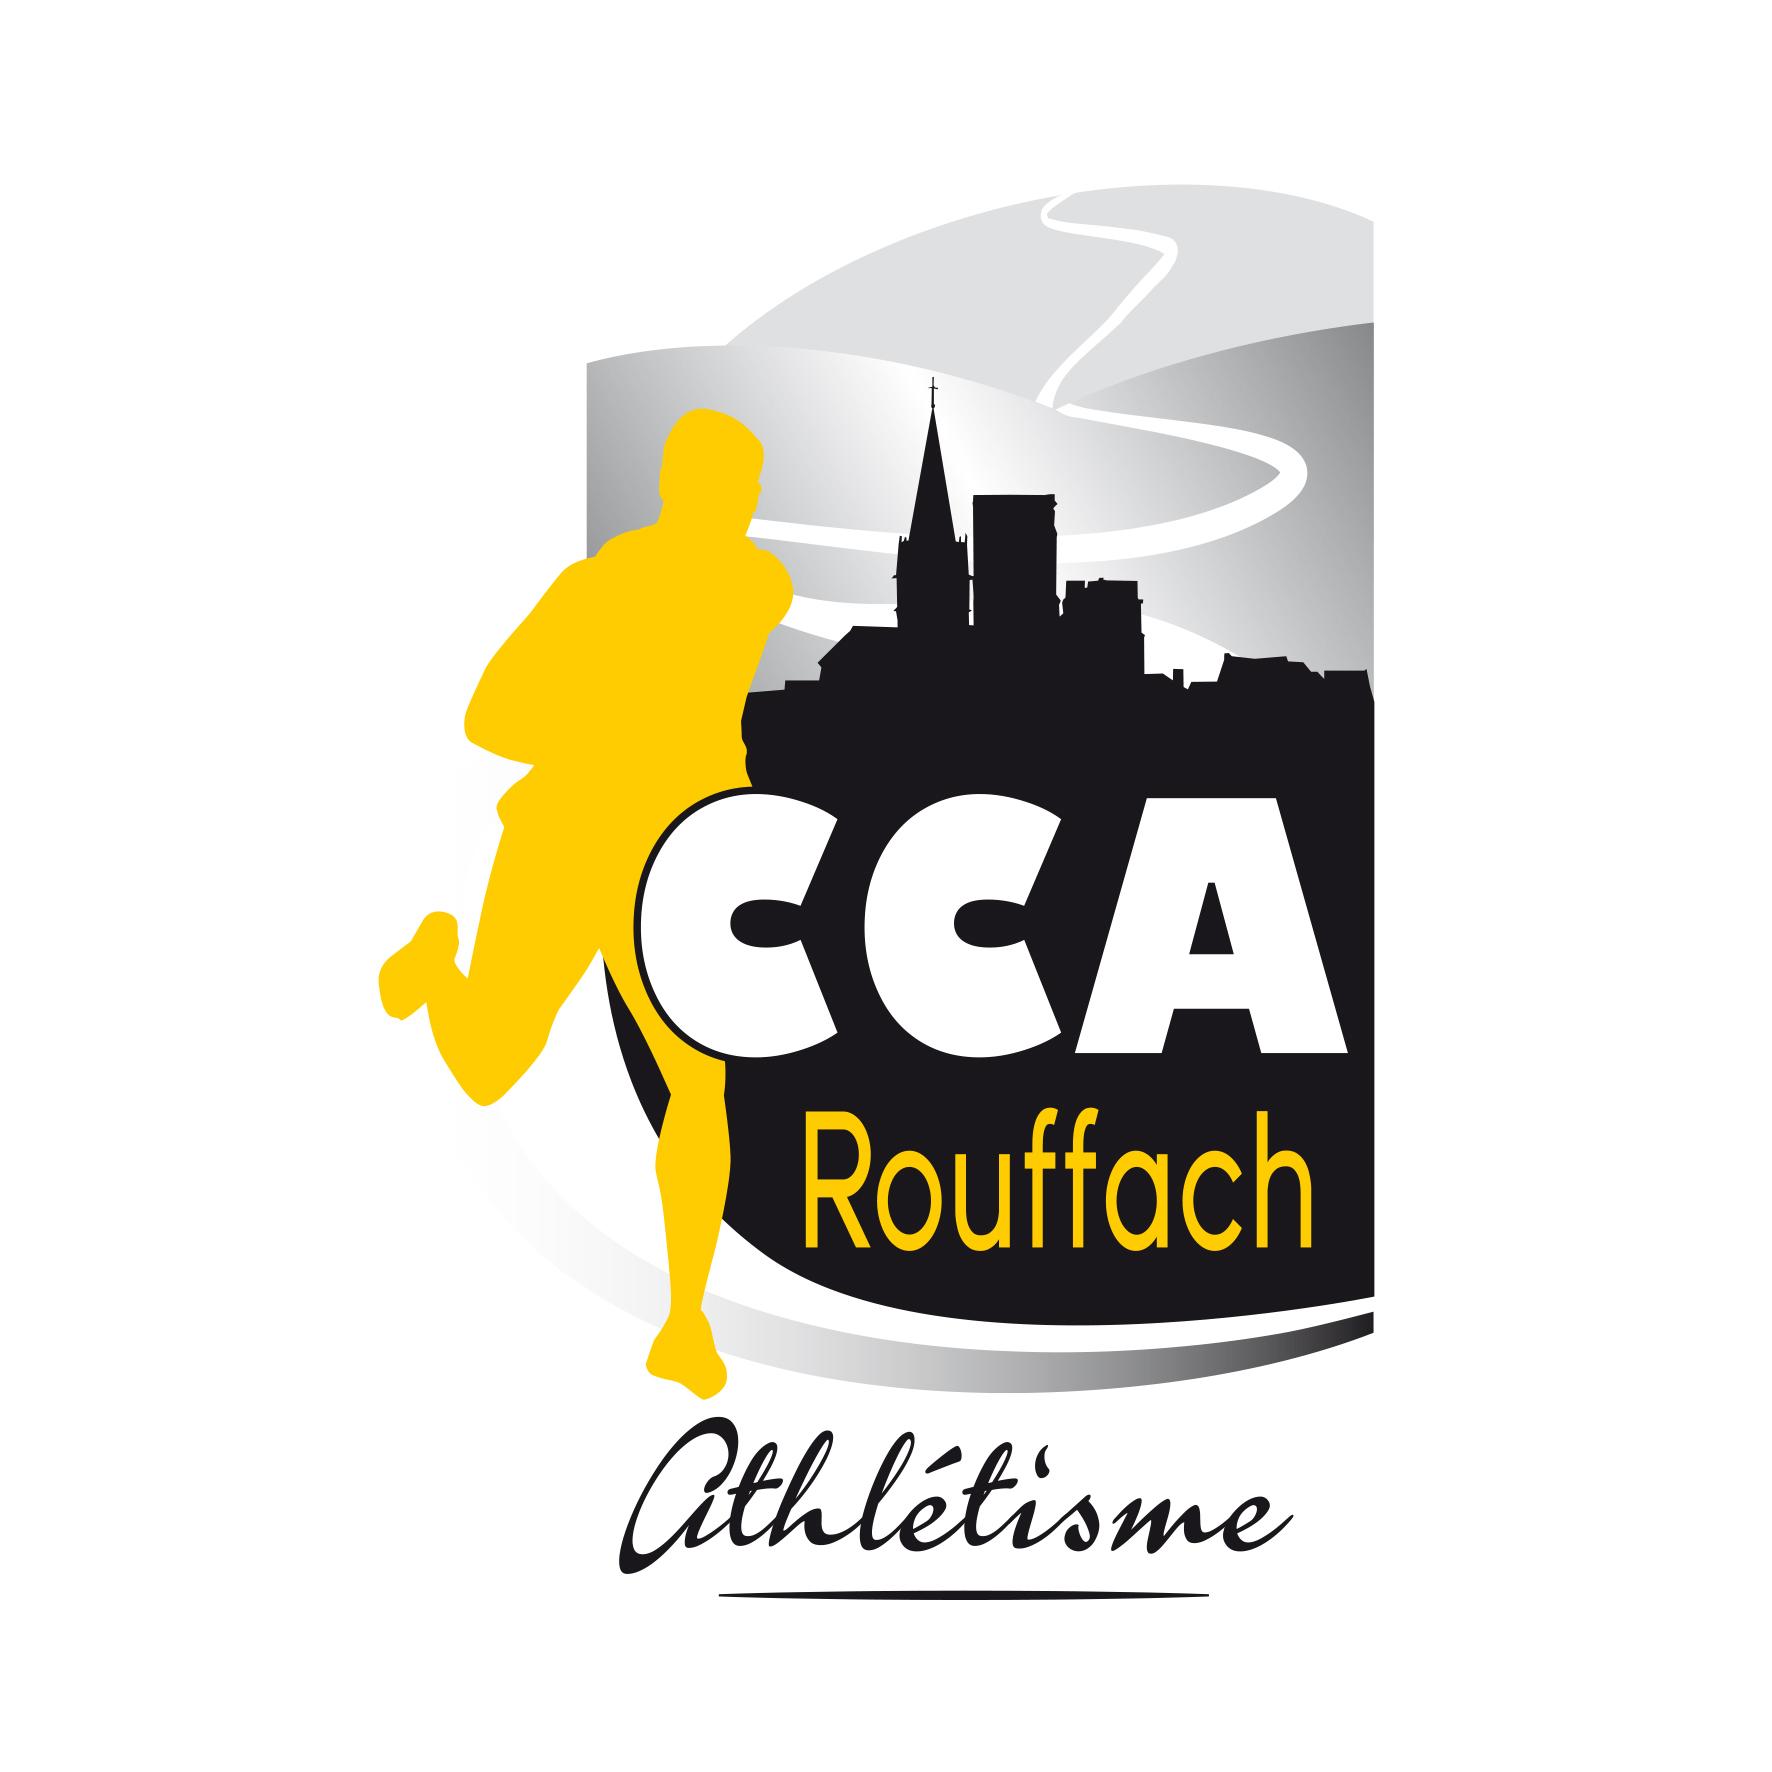 CCA Rouffach